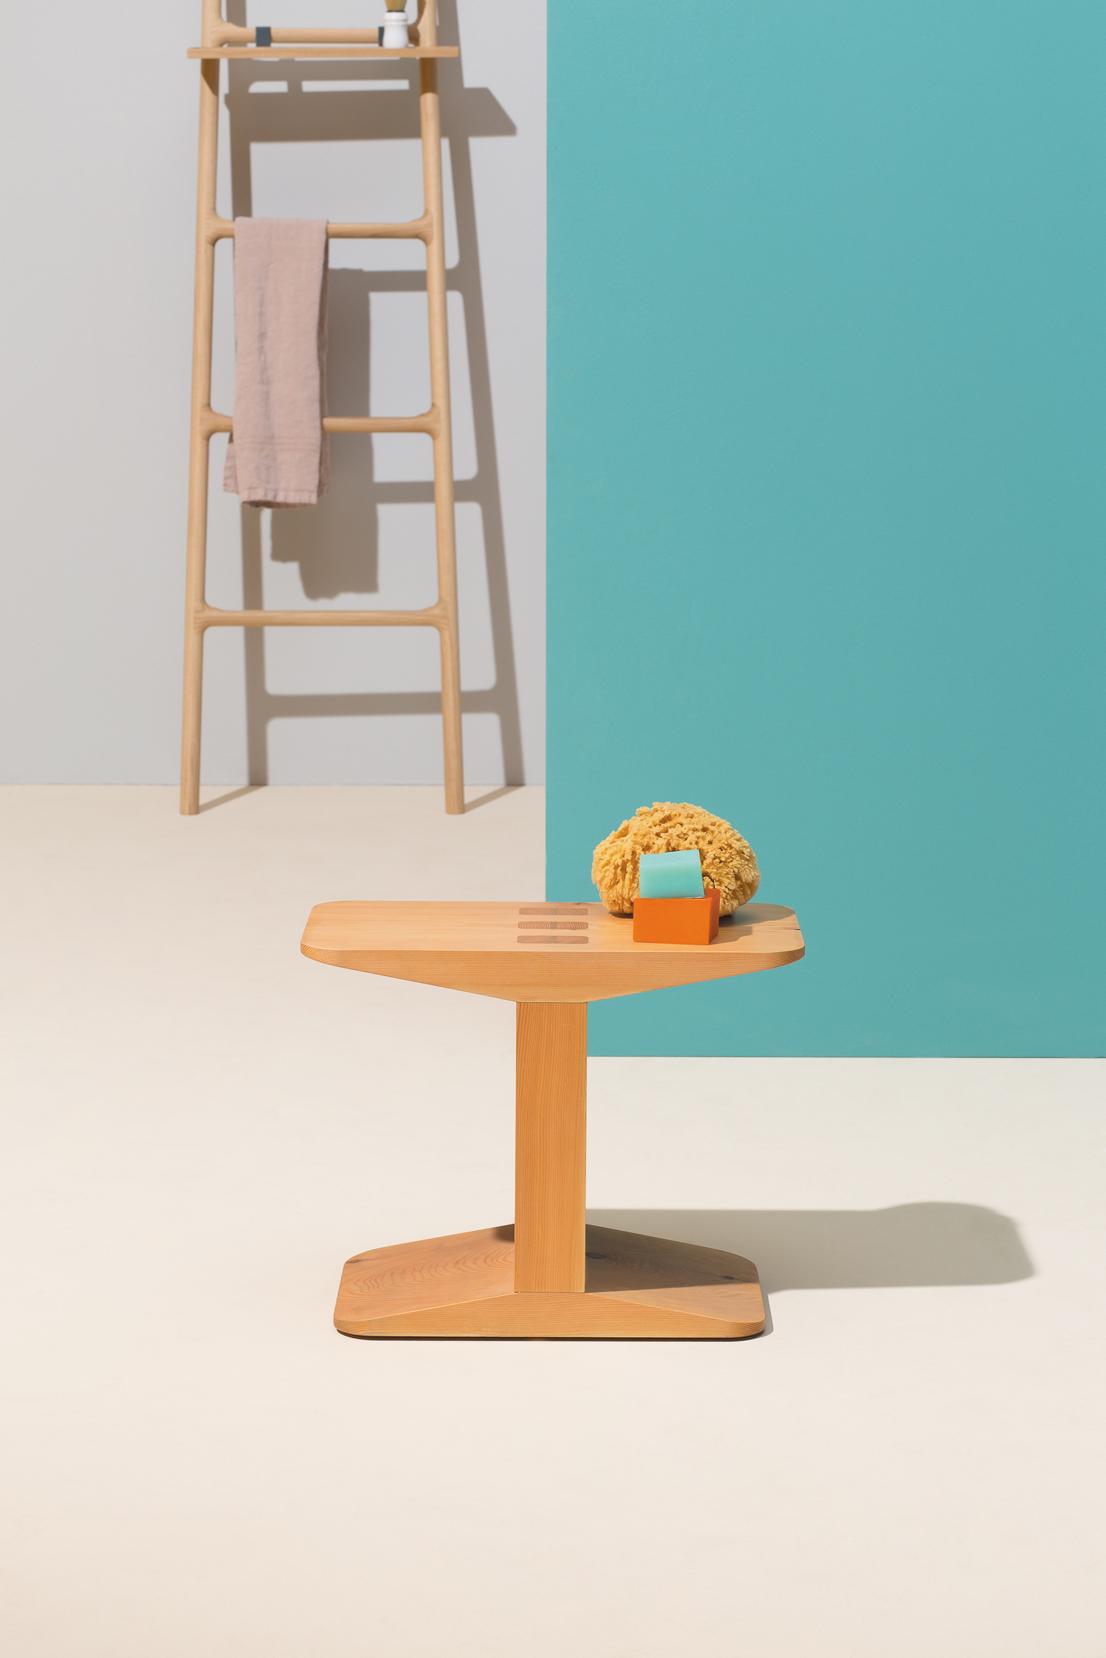 Centanni, design by James Irvine for Discipline, 2012.